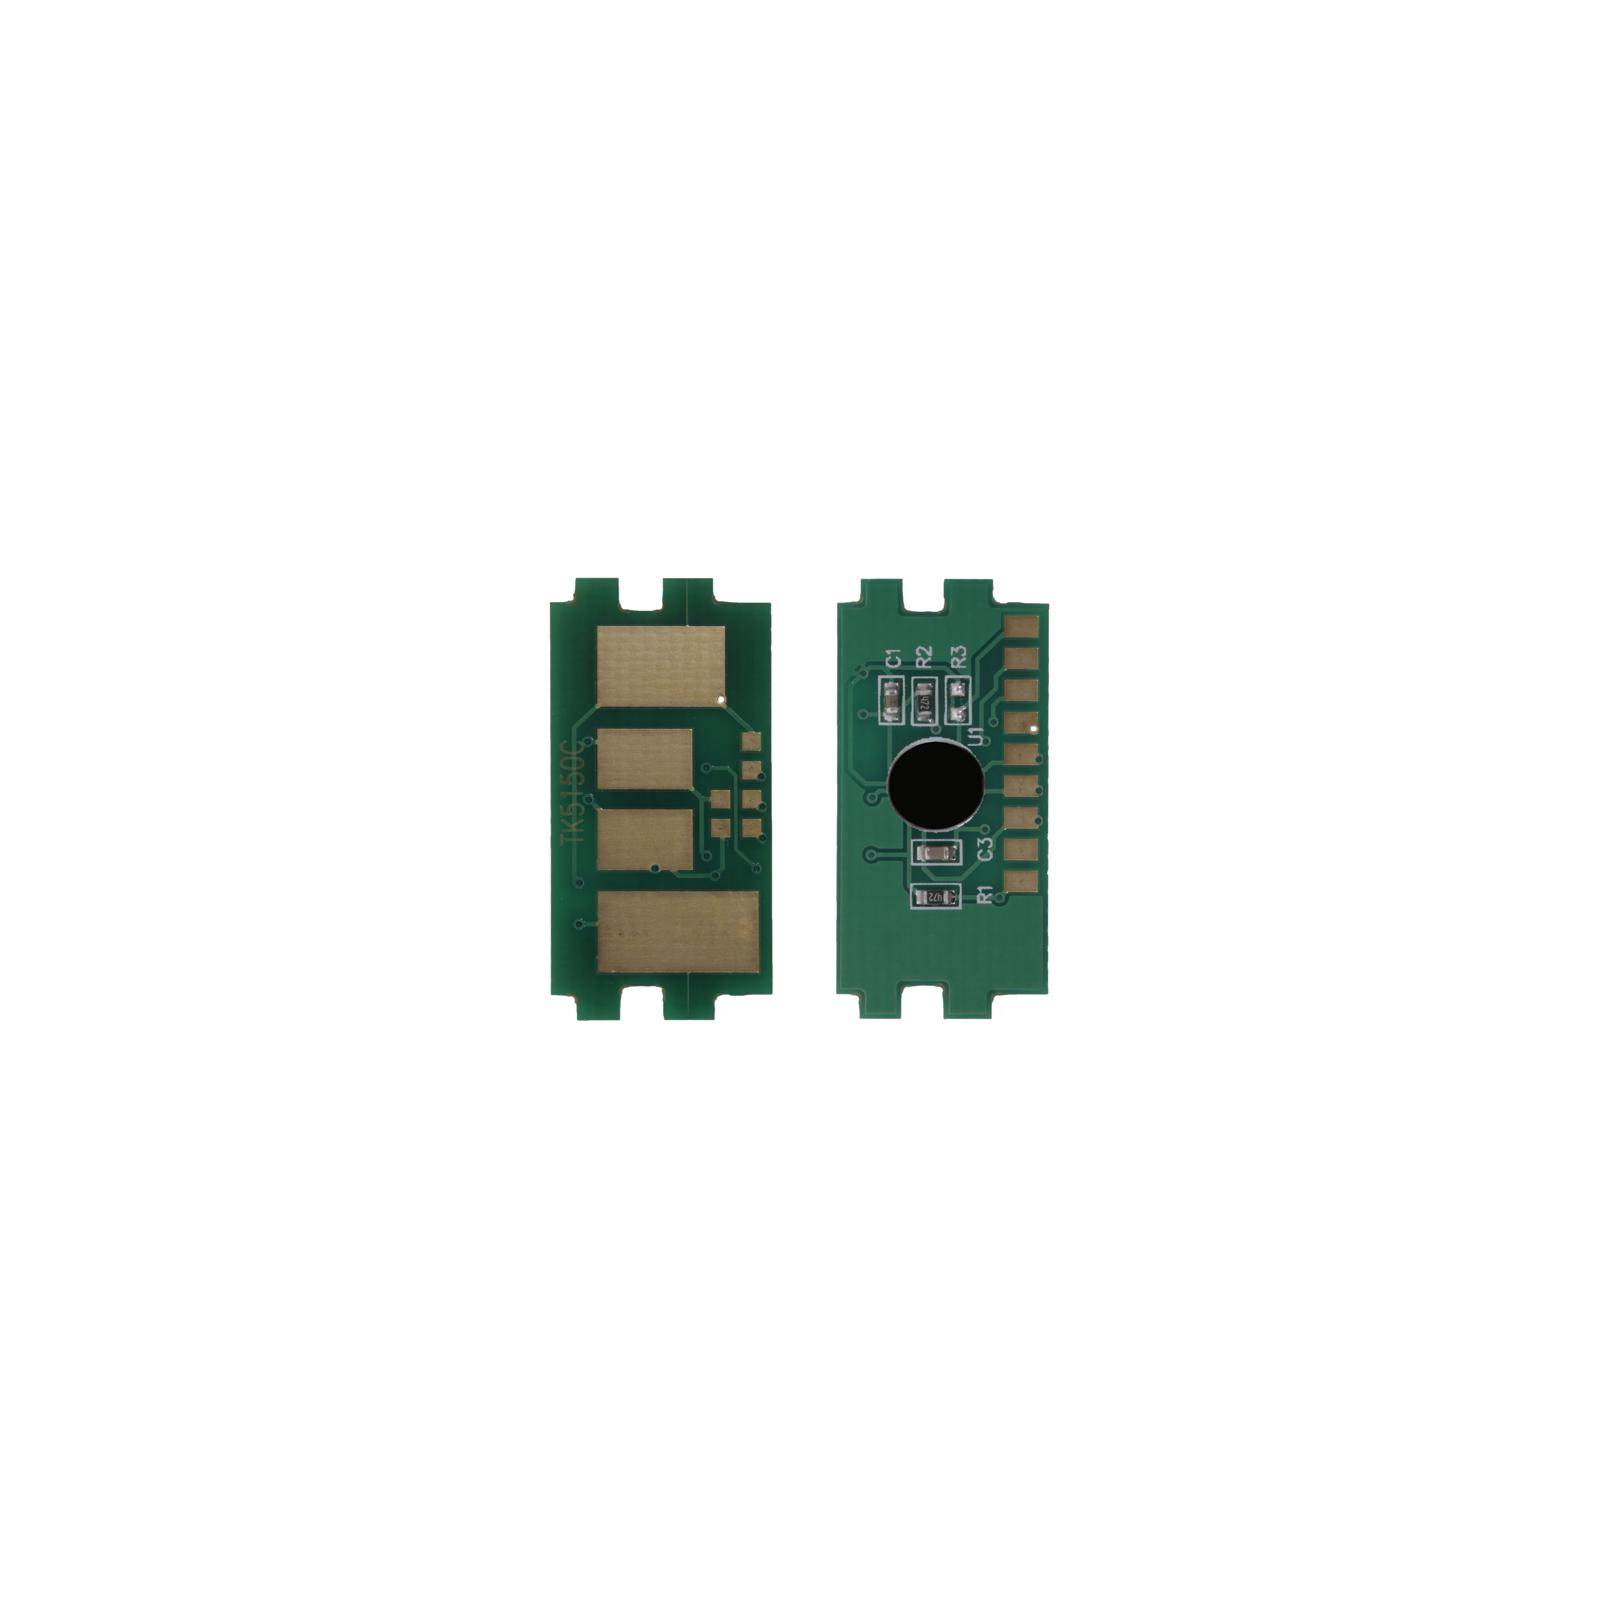 Чип для картриджа Kyocera TK-5150Y (EU) 10k yellow Static Control (TK5150CP-YEU)